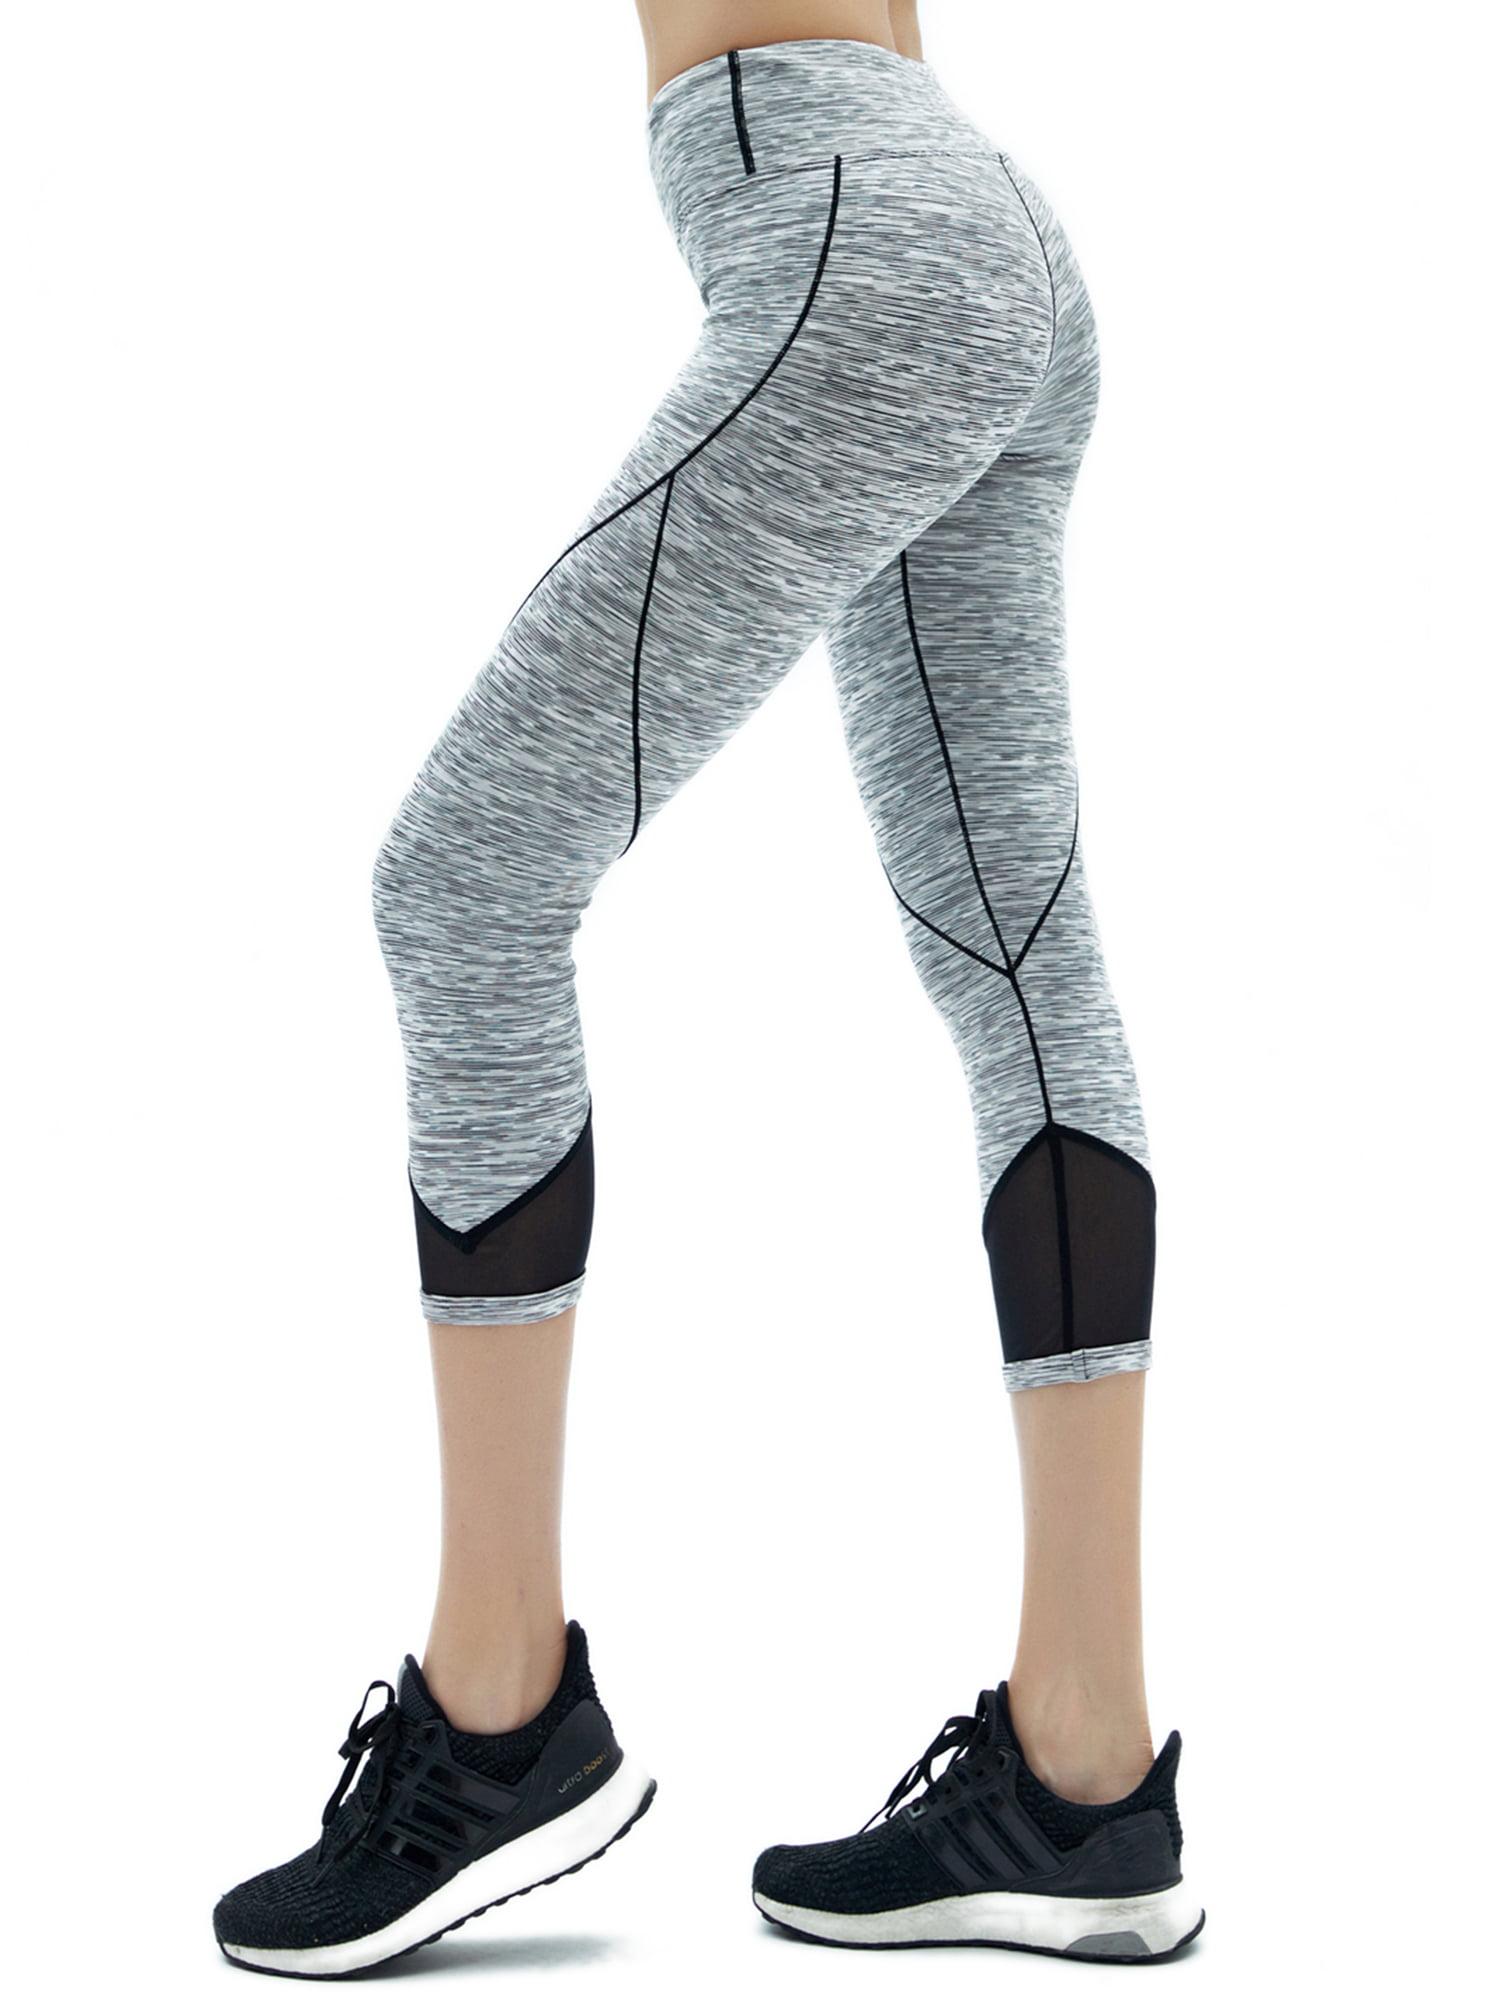 Carters Girls Workout Yogo Pants